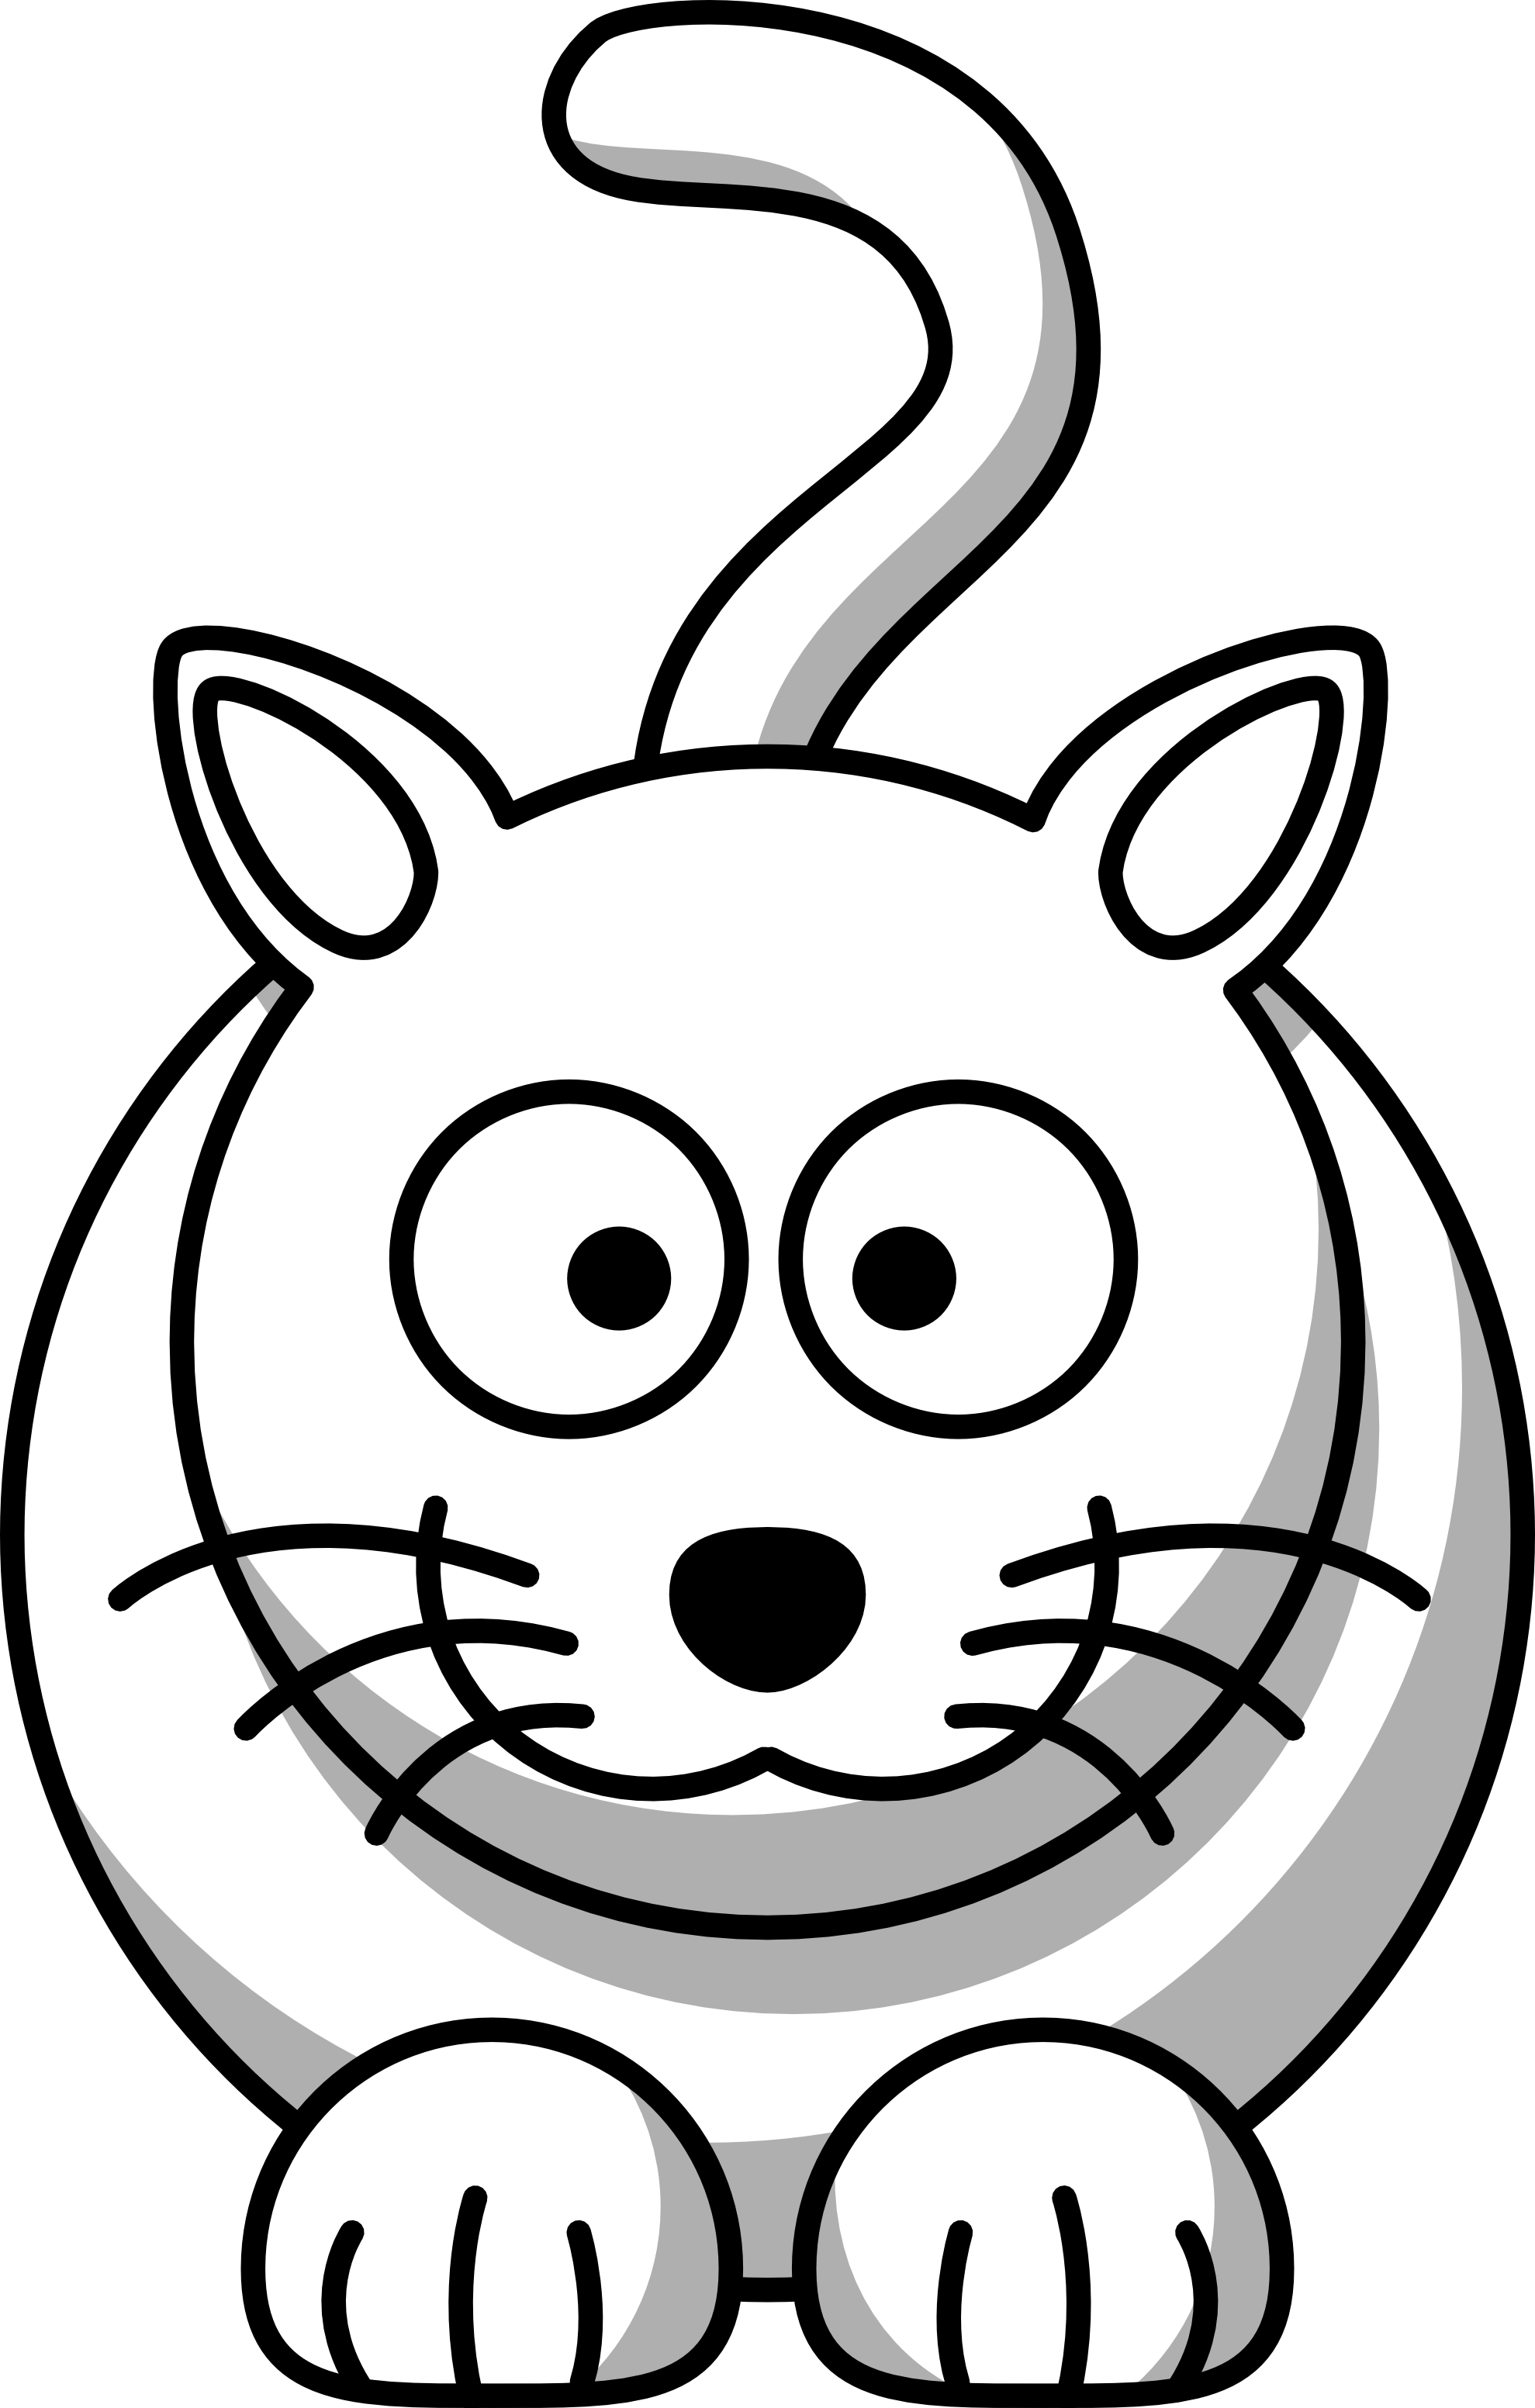 Cat Cartoon Black And White.